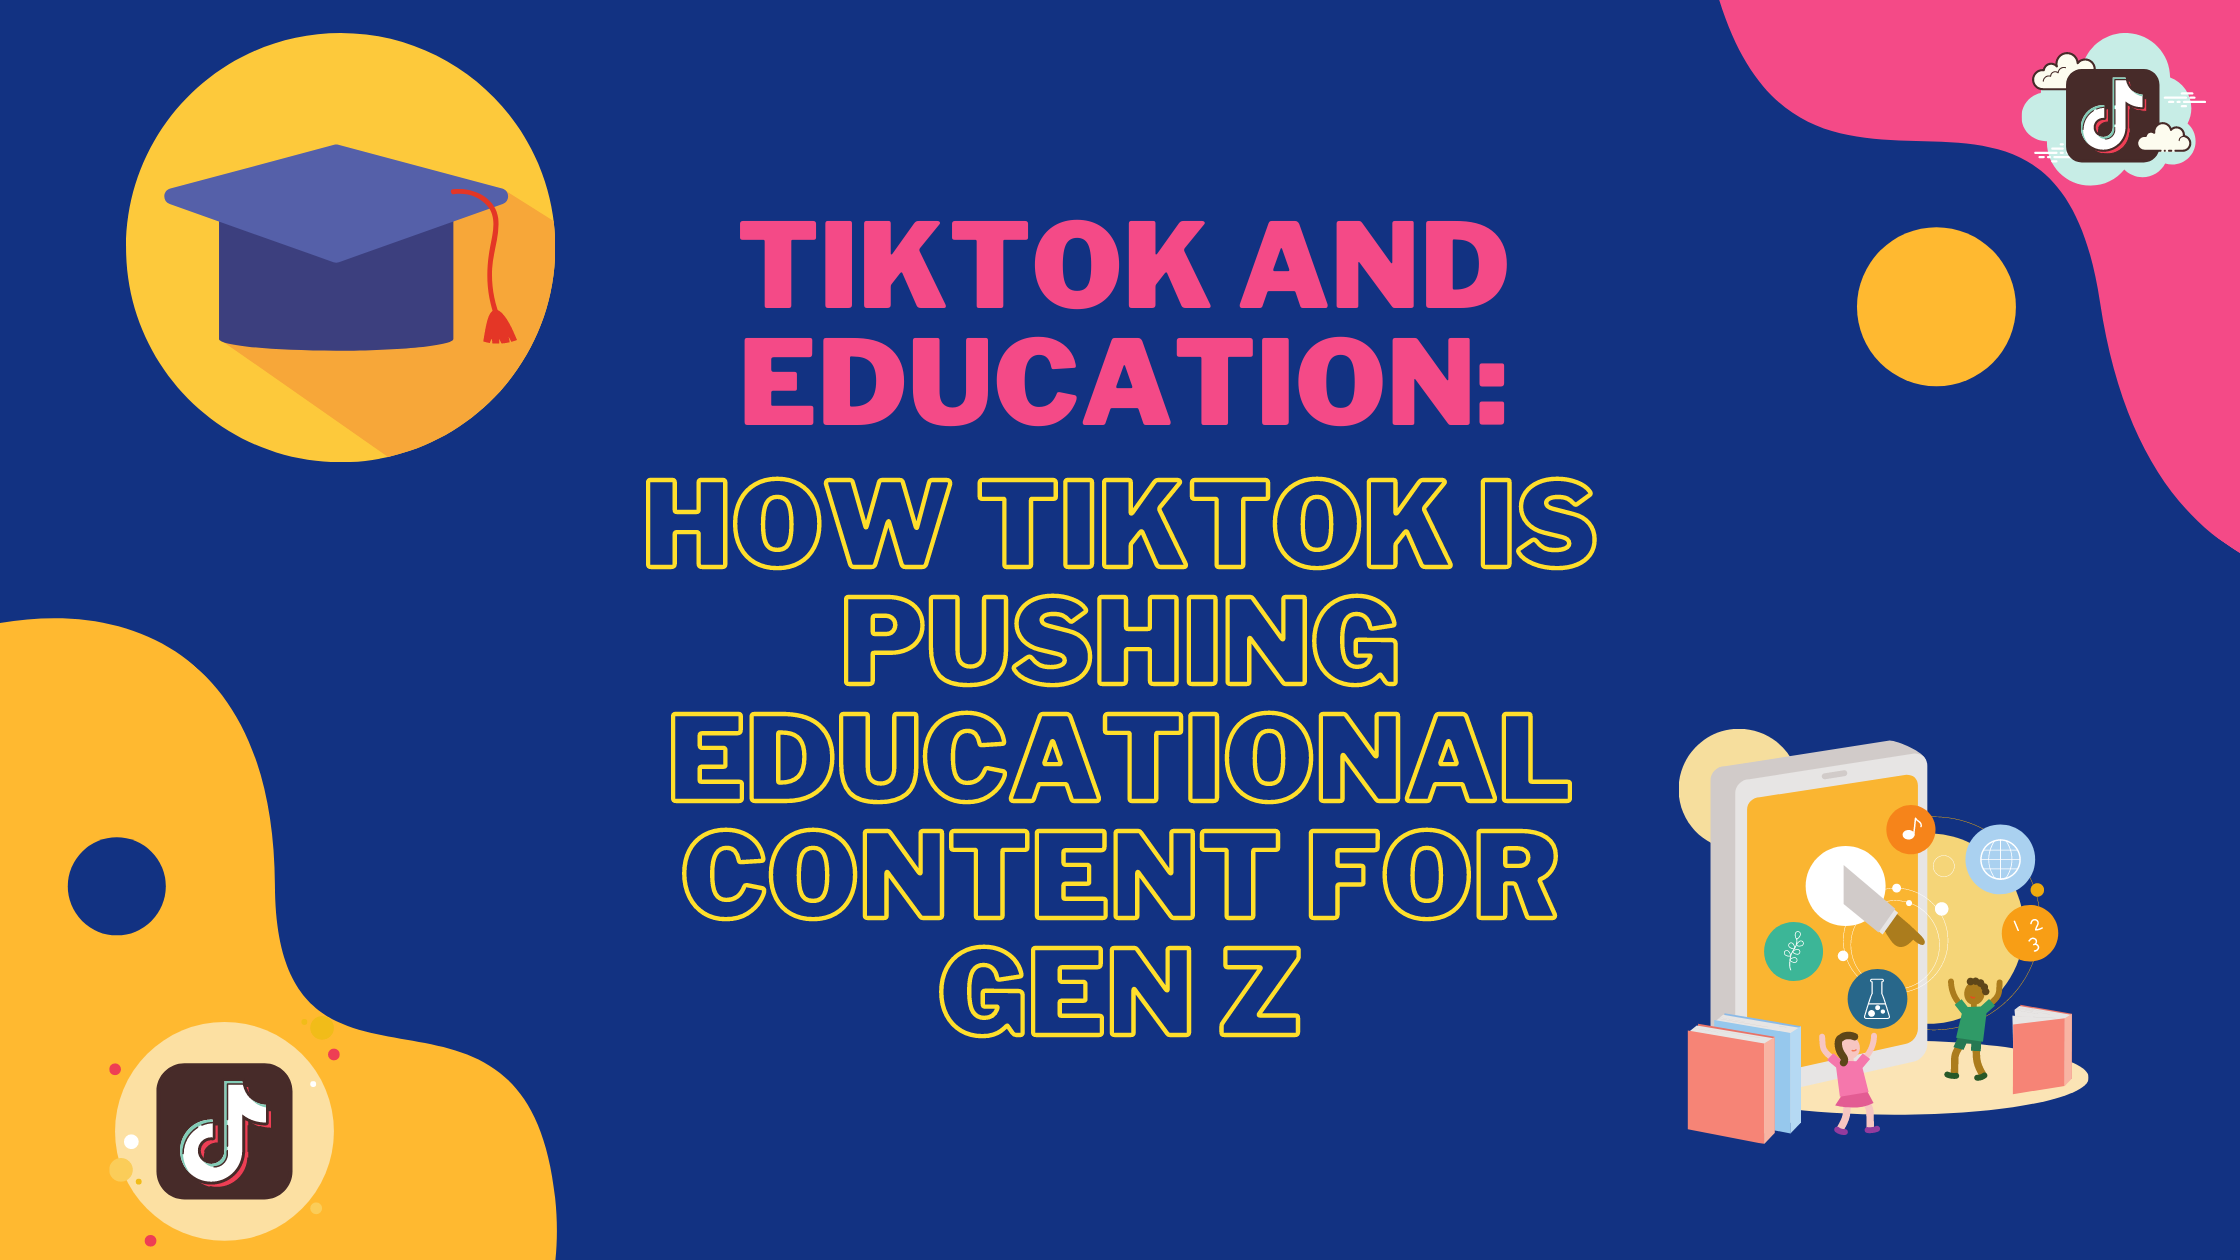 TikTok & Education: How TikTok Is Pushing Educational Content For Gen Z